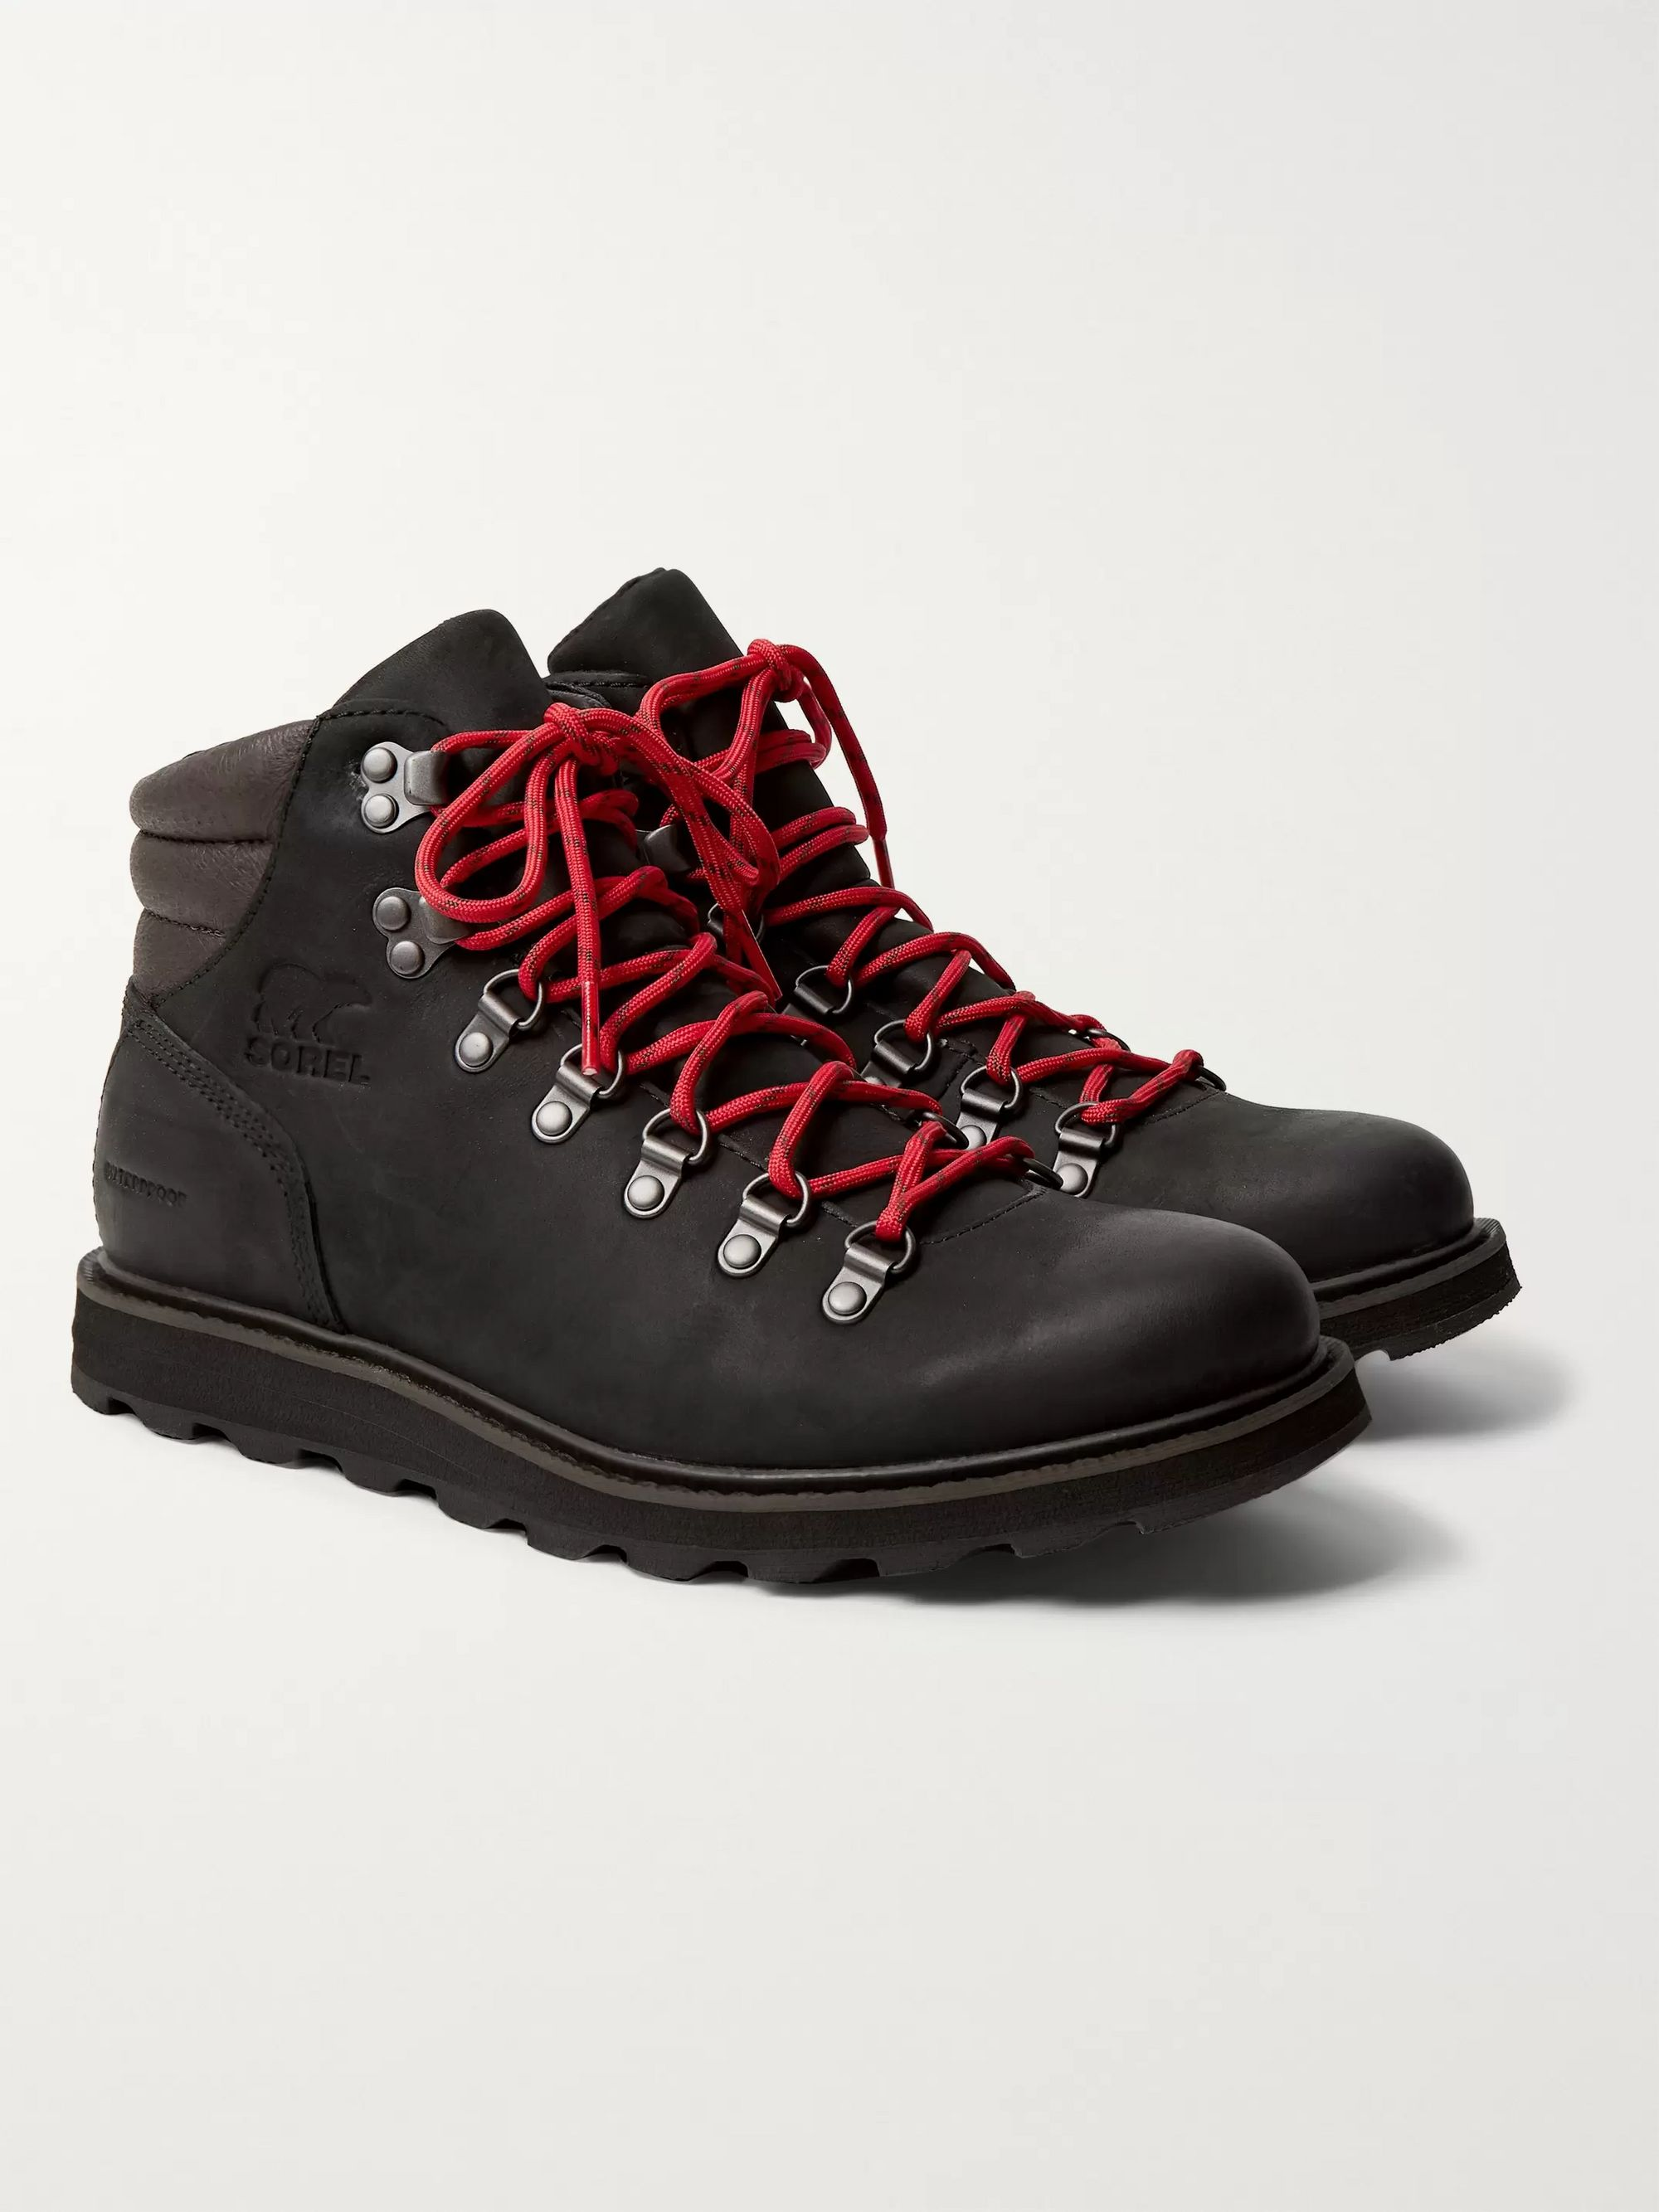 Madson Hiker Waterproof Nubuck Boots by Sorel